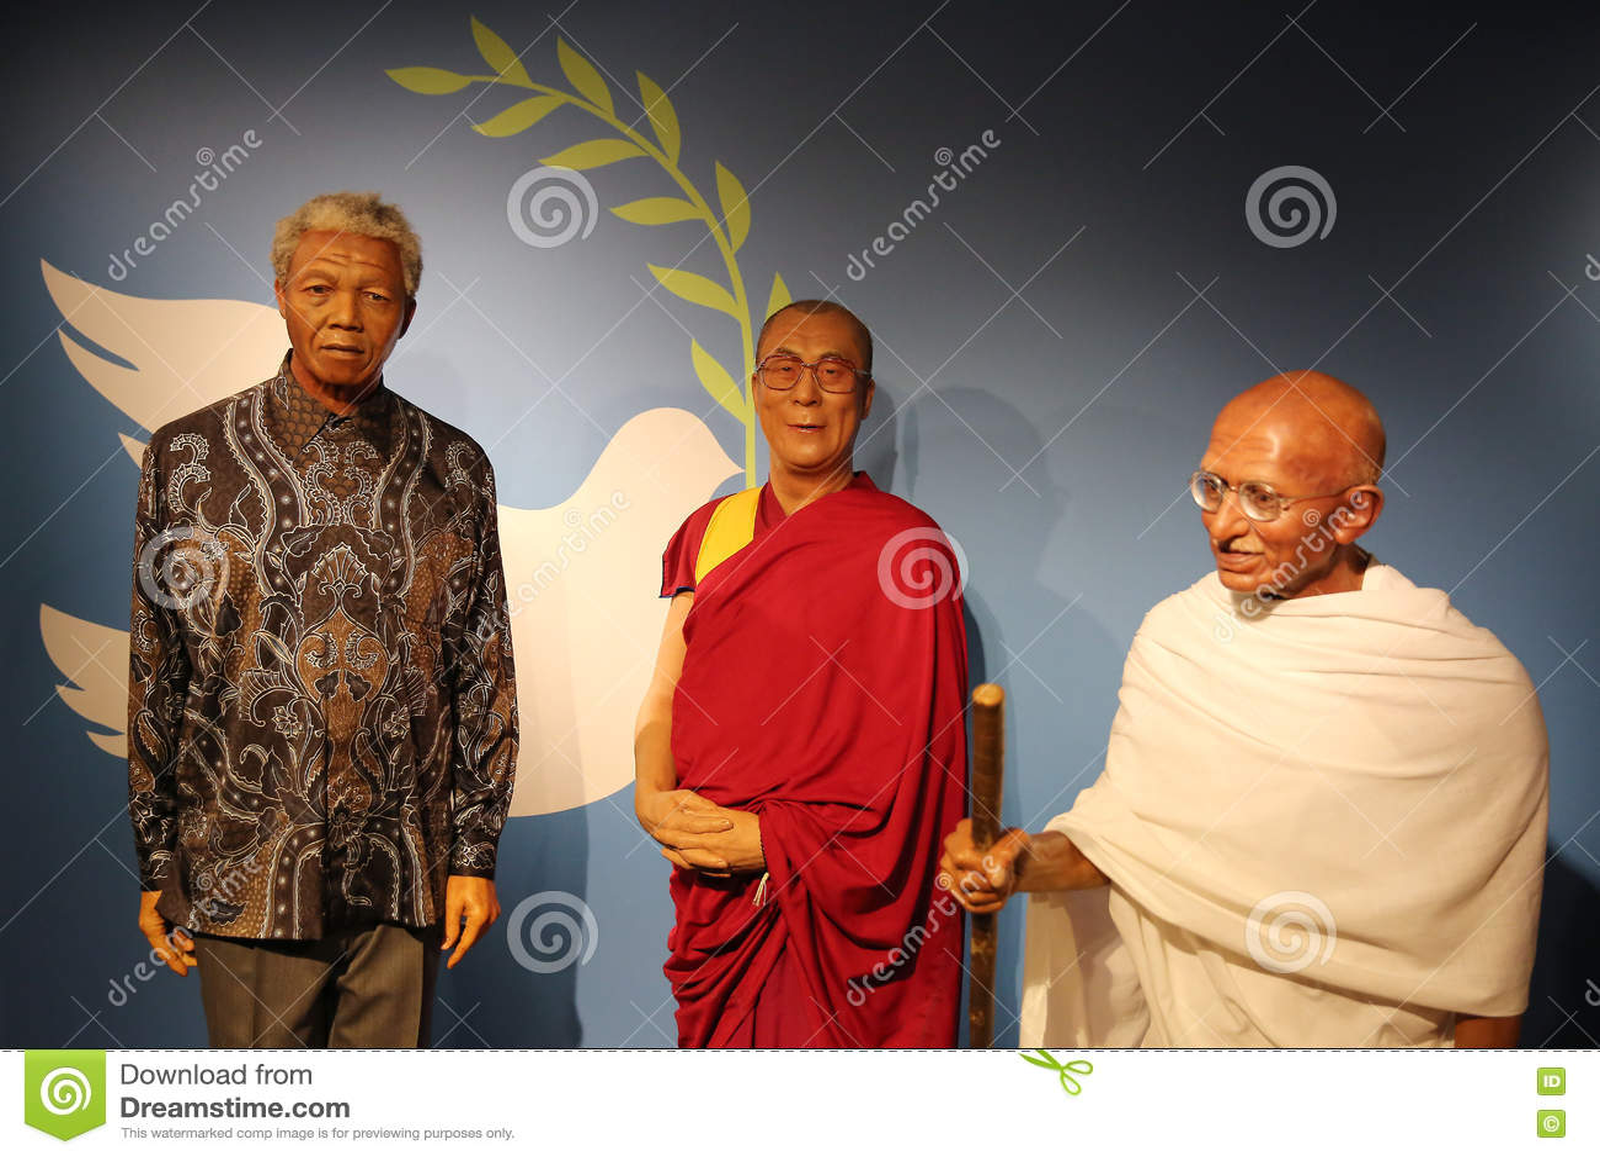 Museo Delle Cere Amsterdam.Nelson Mandela Dalai Lama And Mahatma Gandhi Wax Statues Editorial